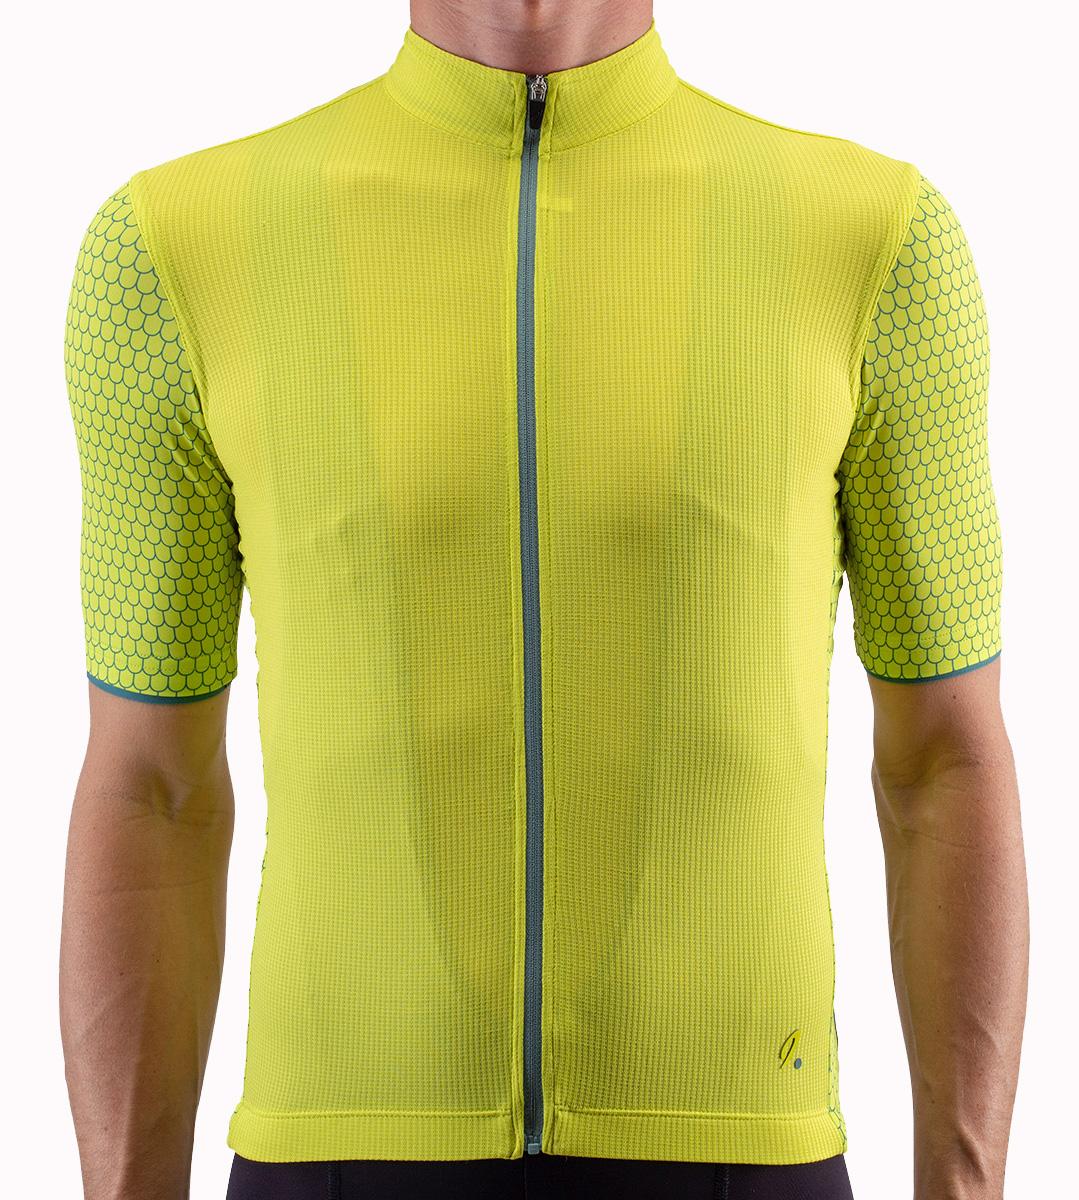 Isadore Climber's Jersey - vrsis XL